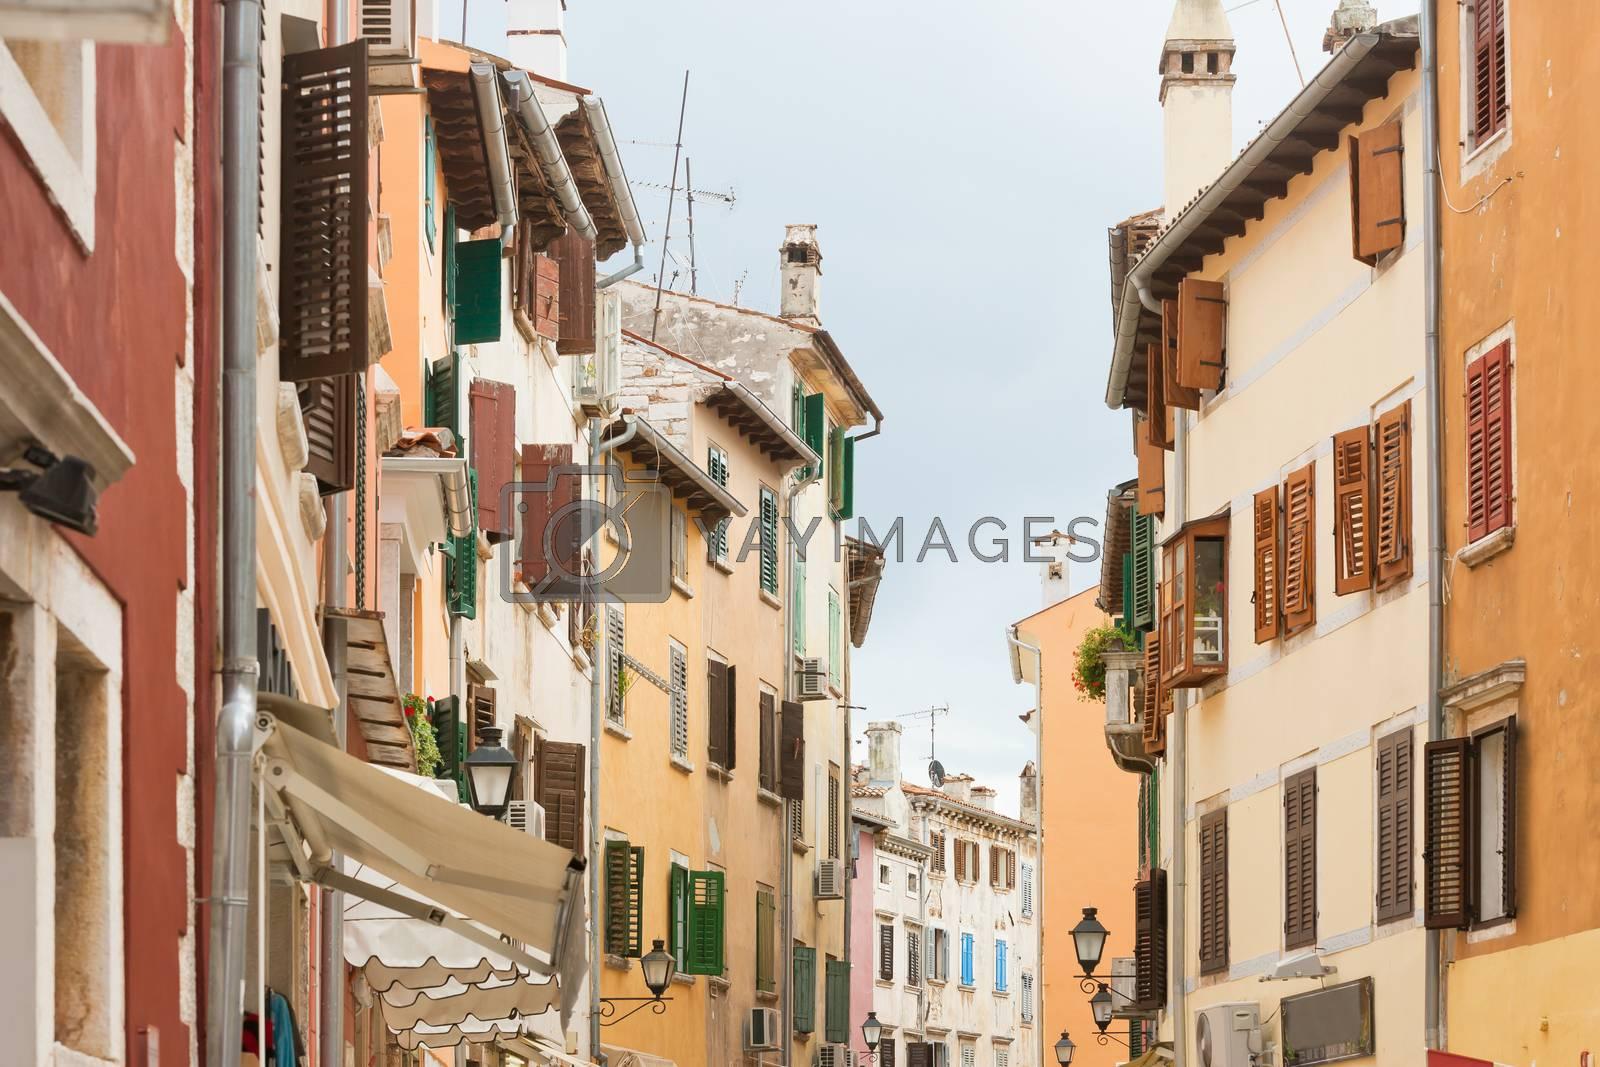 Rovinj, Istria, Croatia, Europe - Coloured facades at the city center of Rovinj